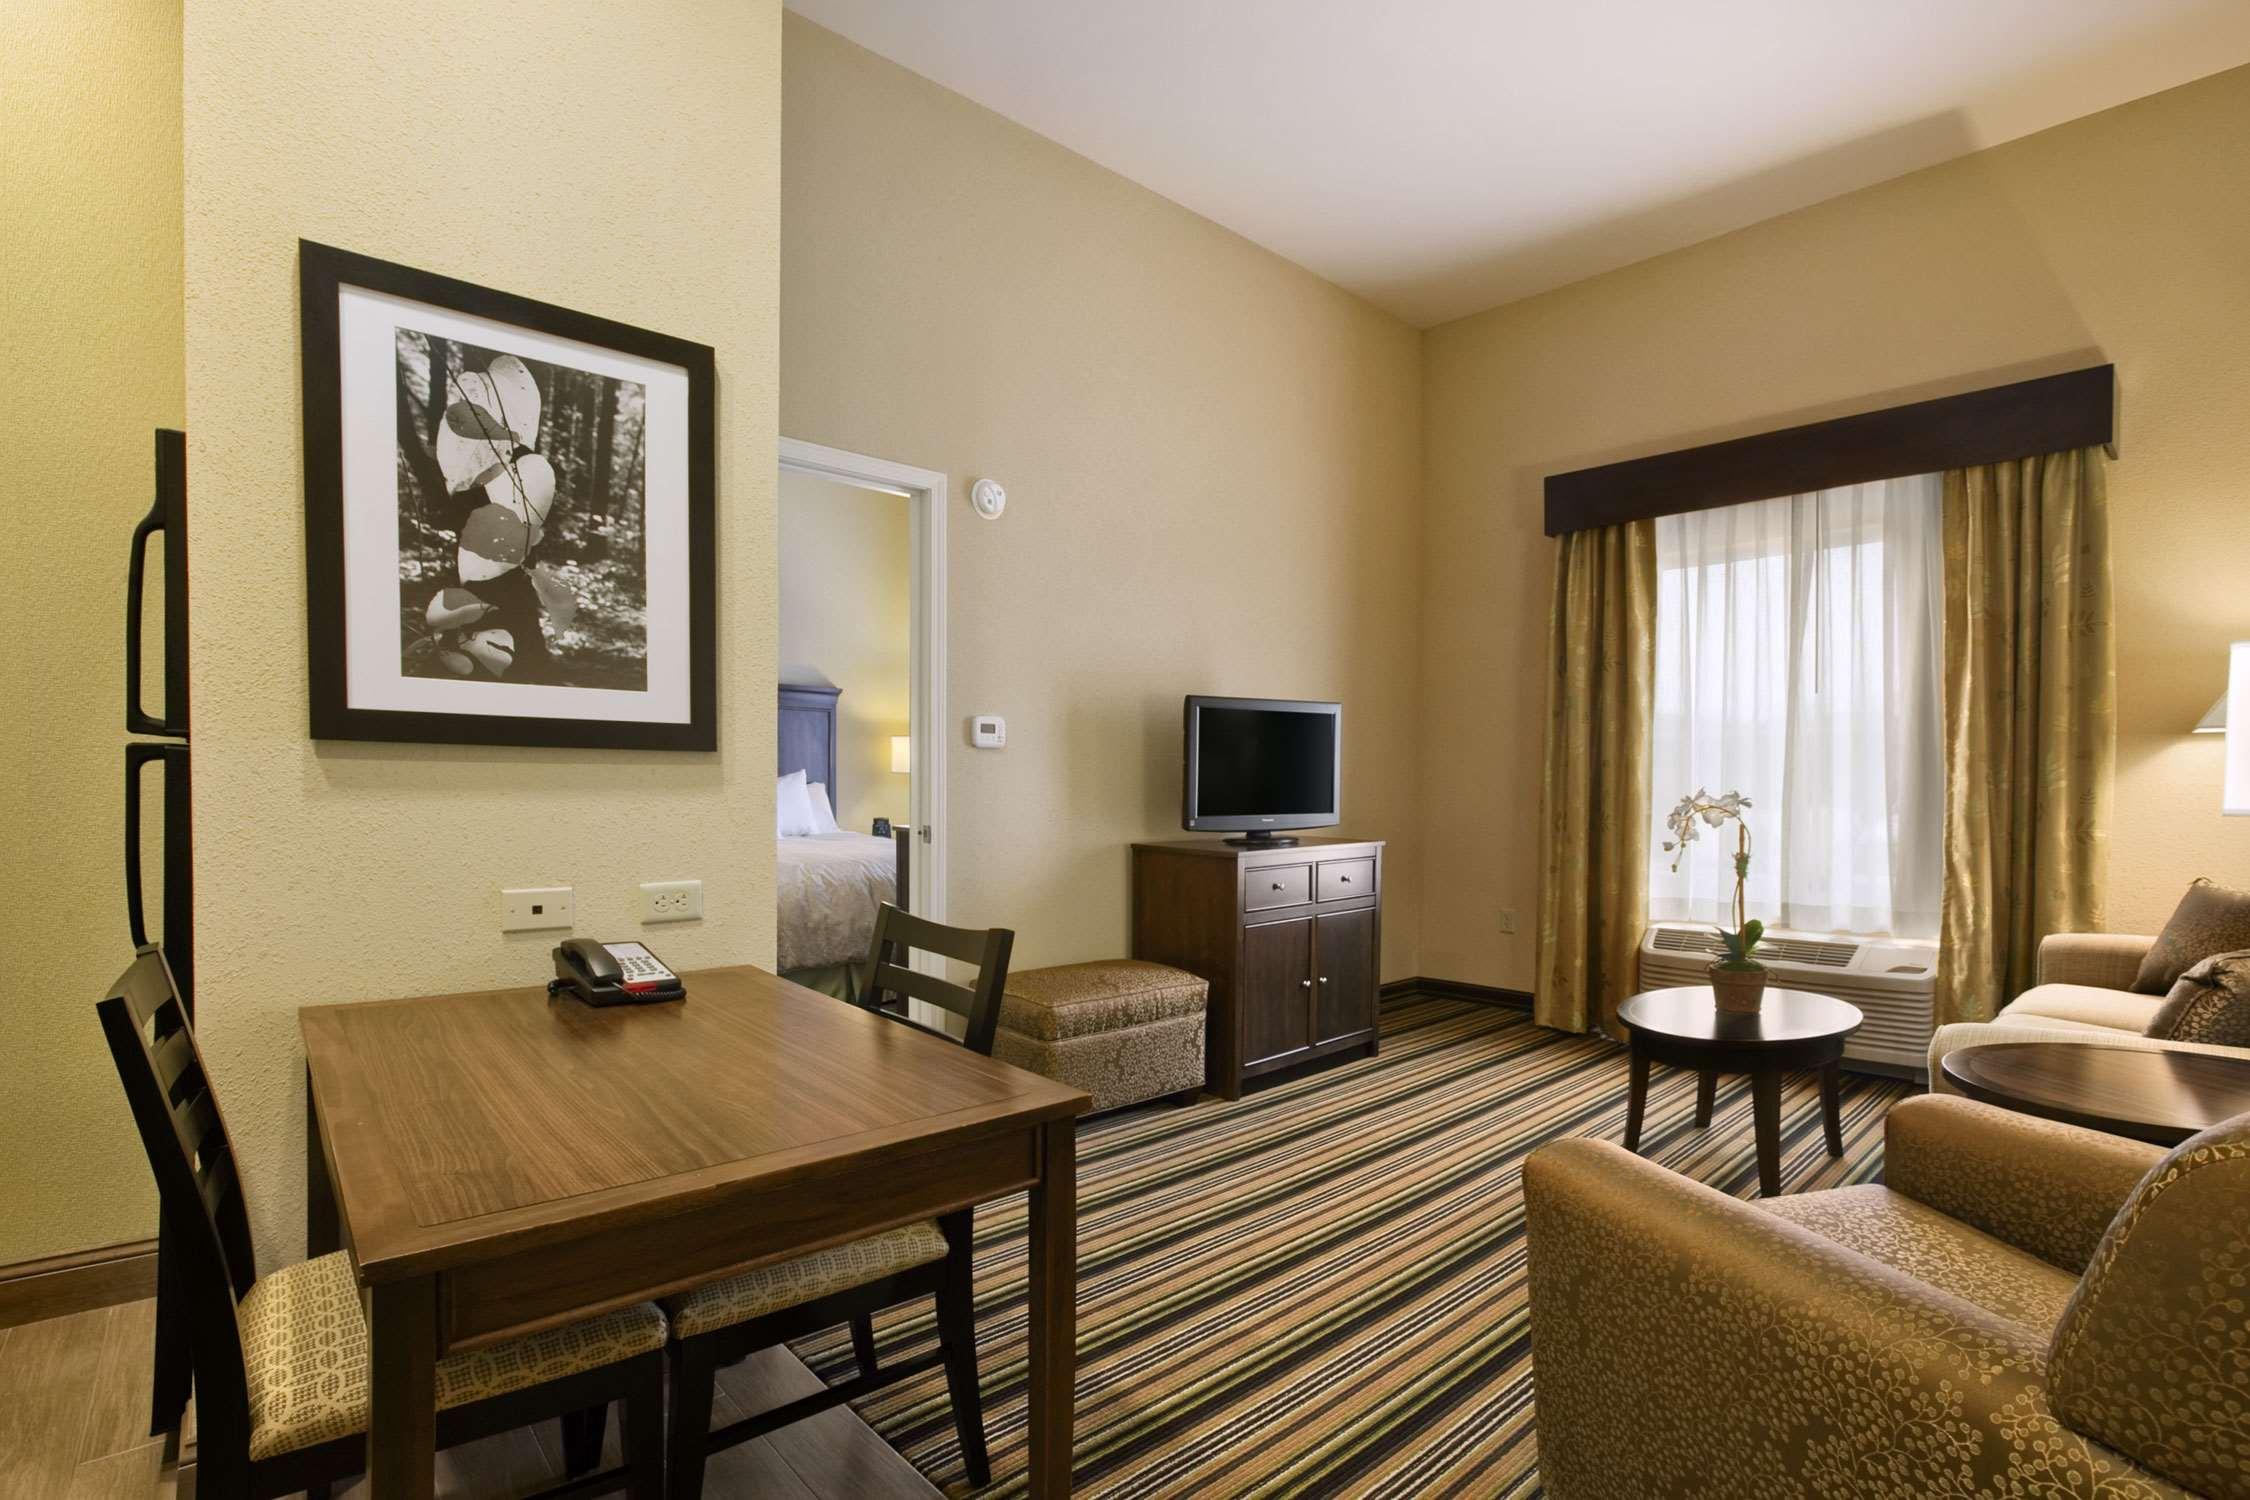 Homewood Suites by Hilton Charlotte/Ayrsley, NC image 7